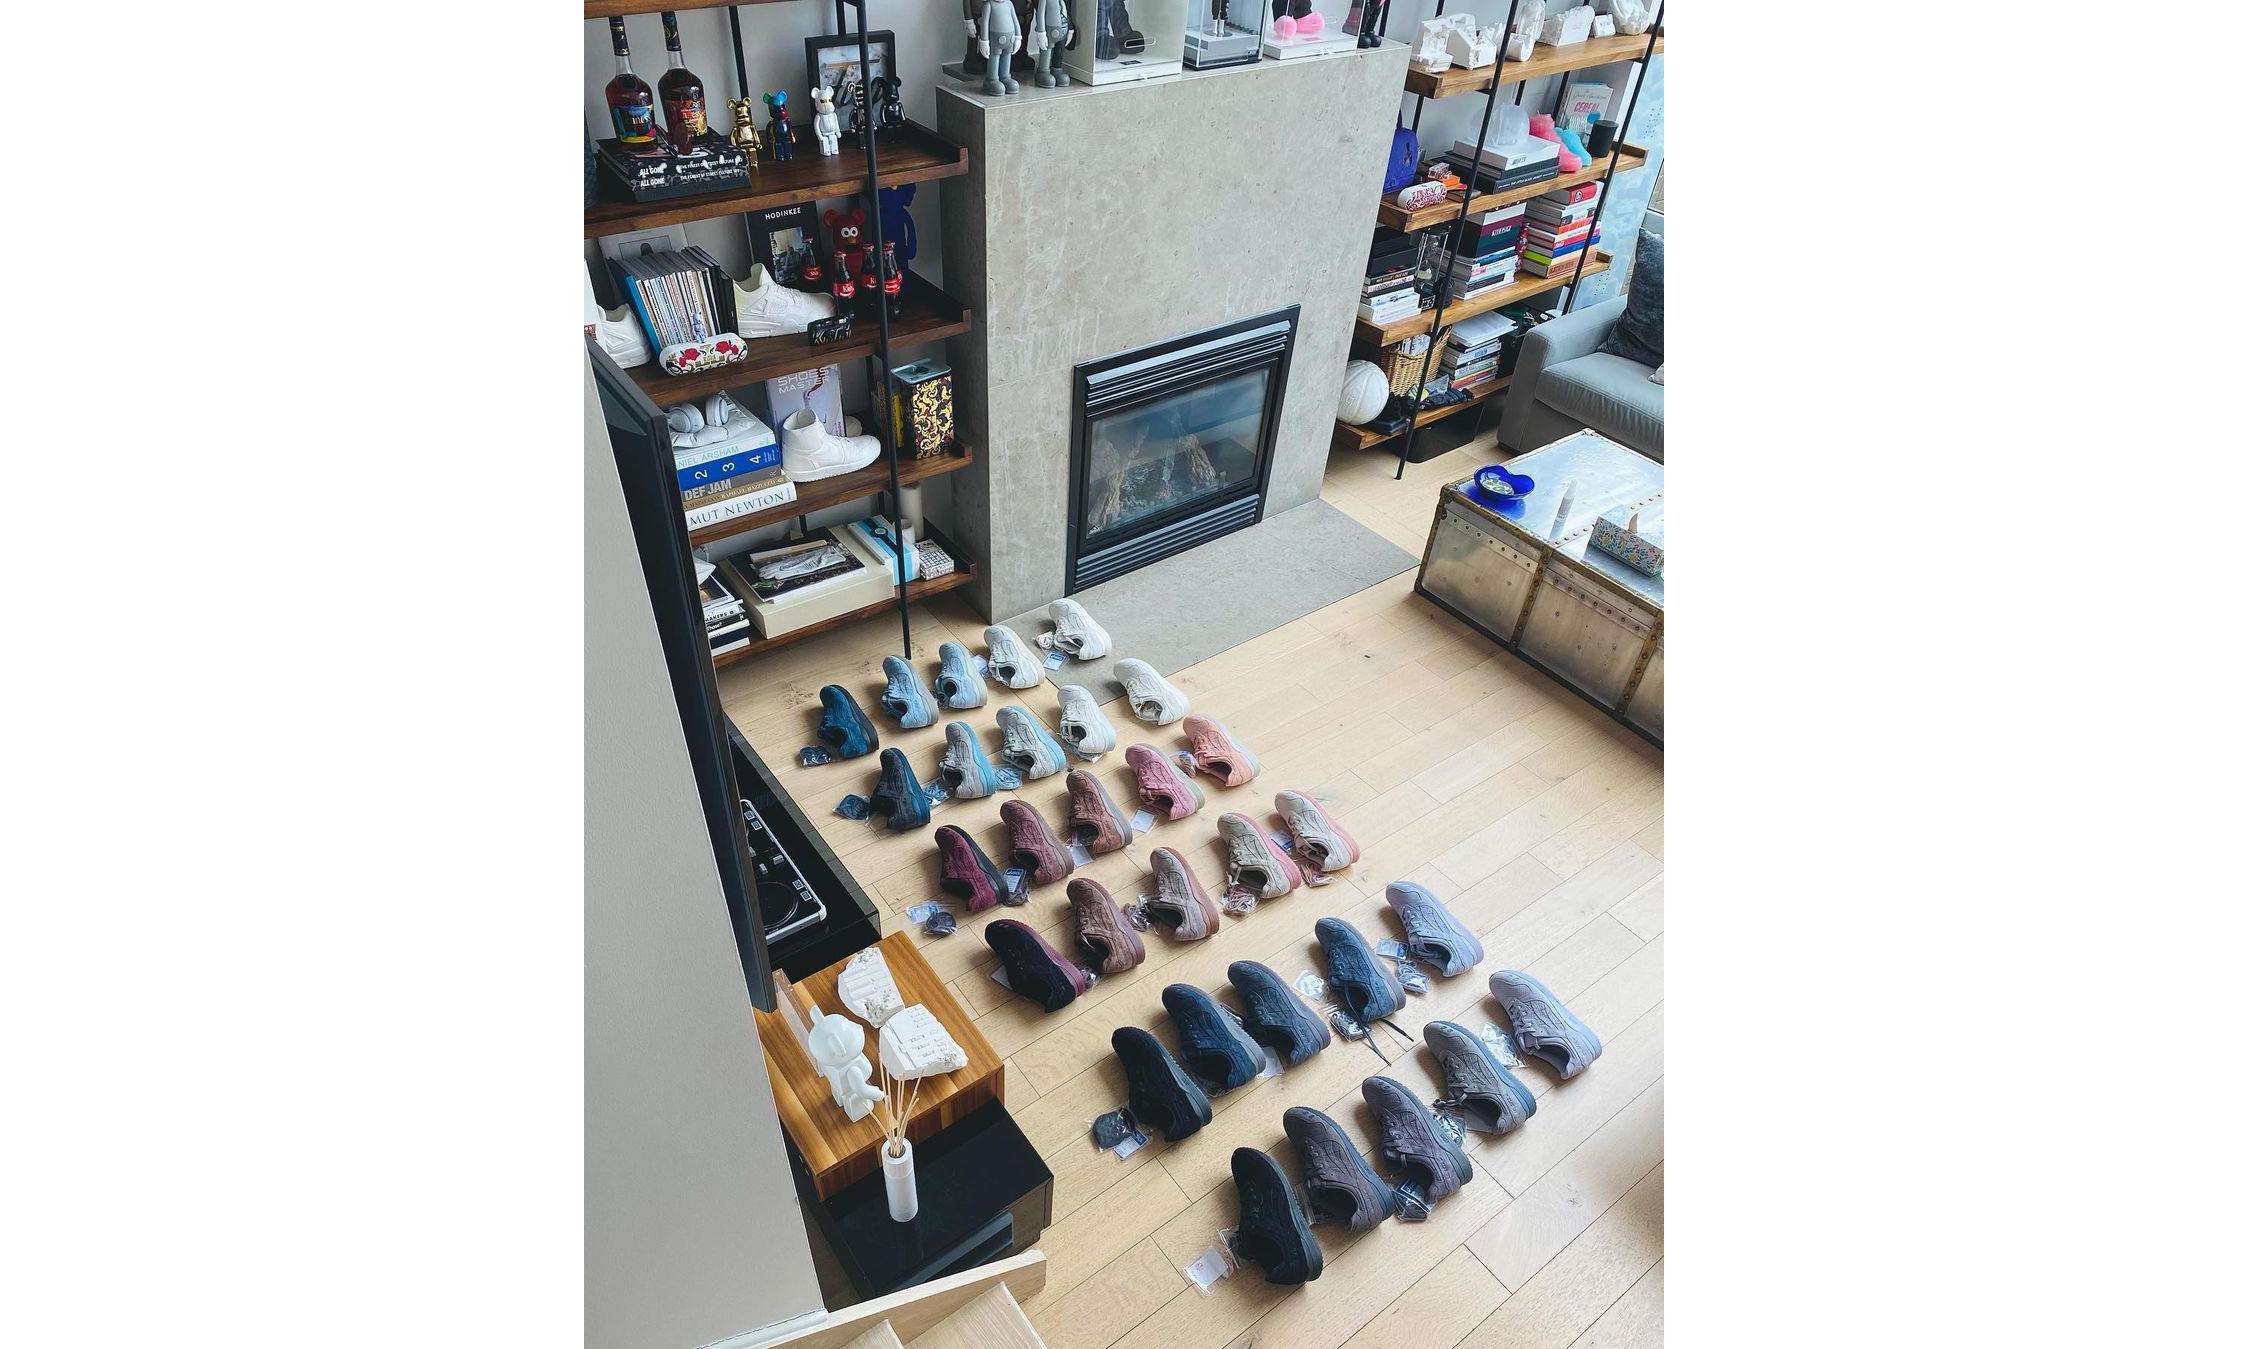 Ronnie Fieg 一次性曝光 30 双新配色 ASICS 联名球鞋